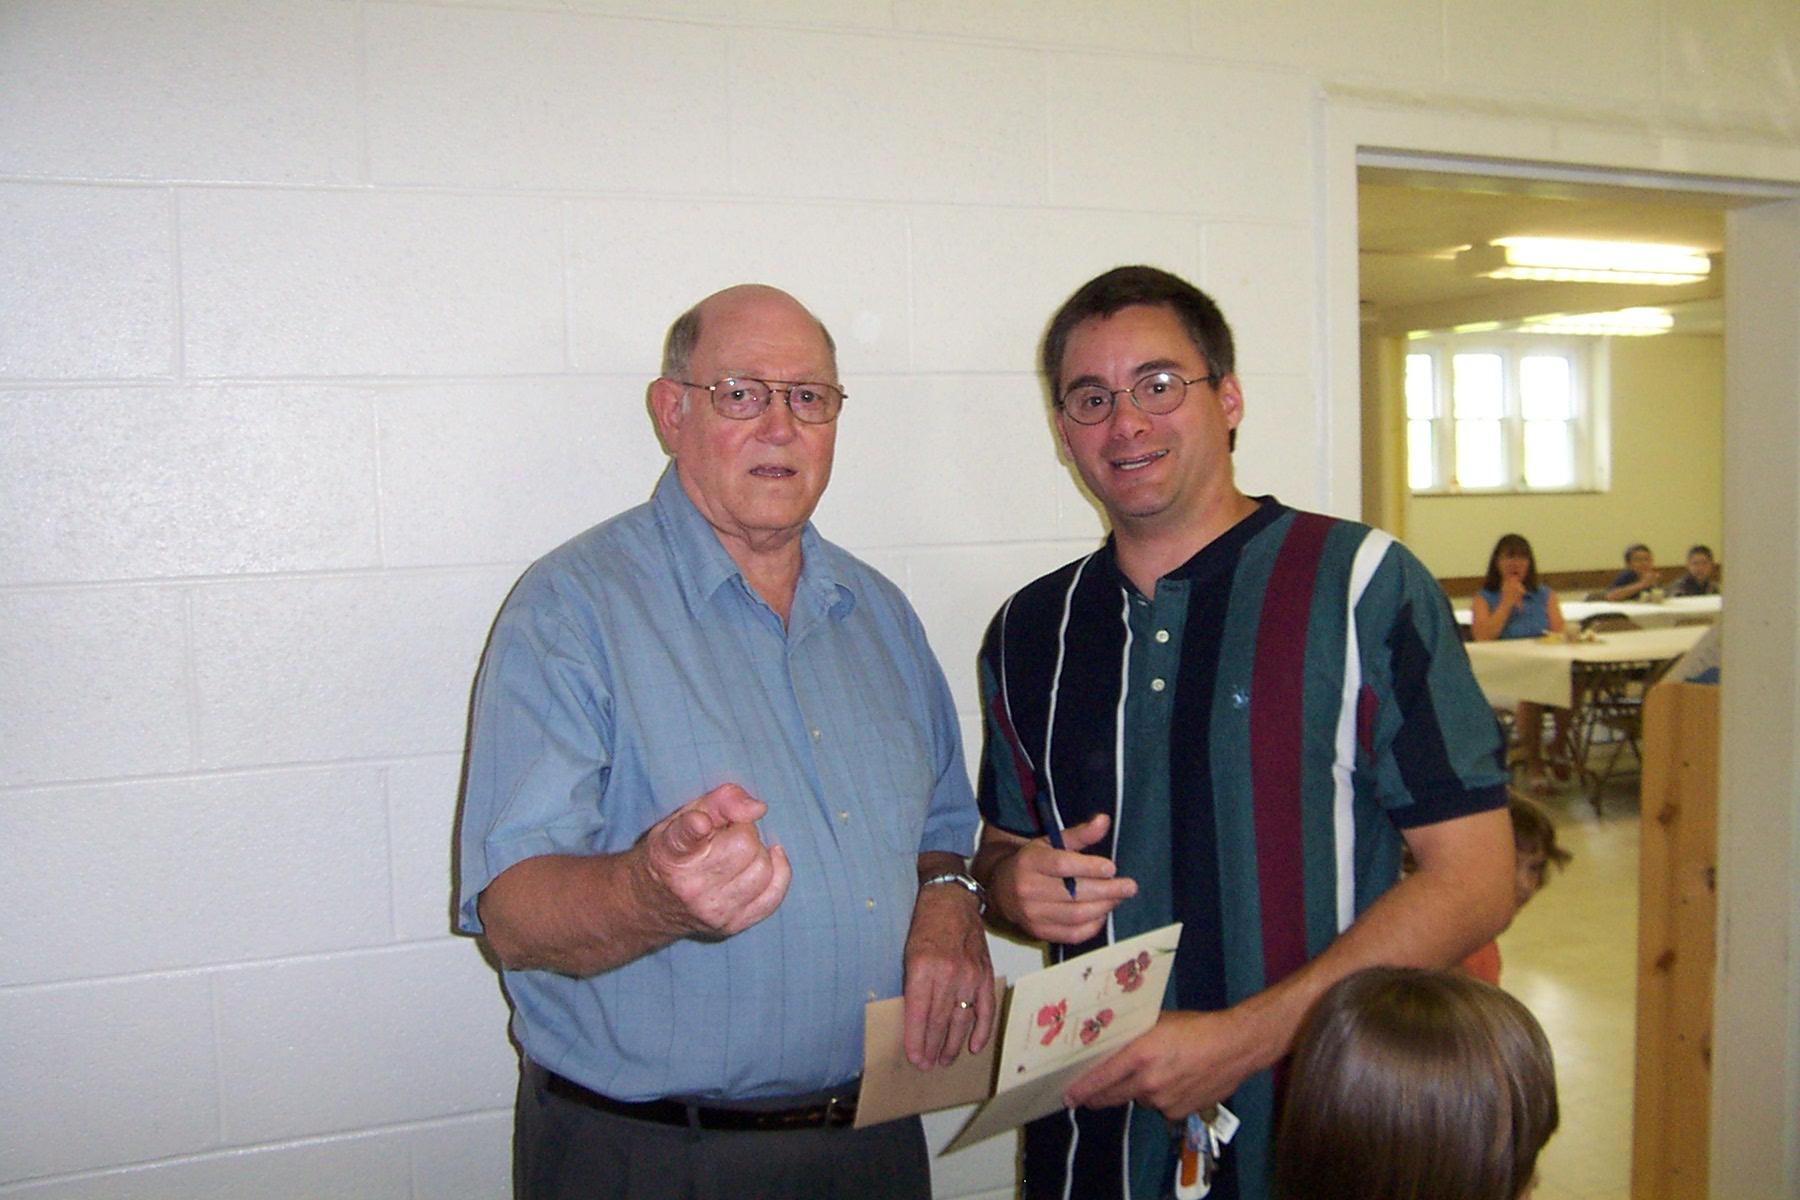 Jim Groseclose & Vince Redding - 2008-06-29 025